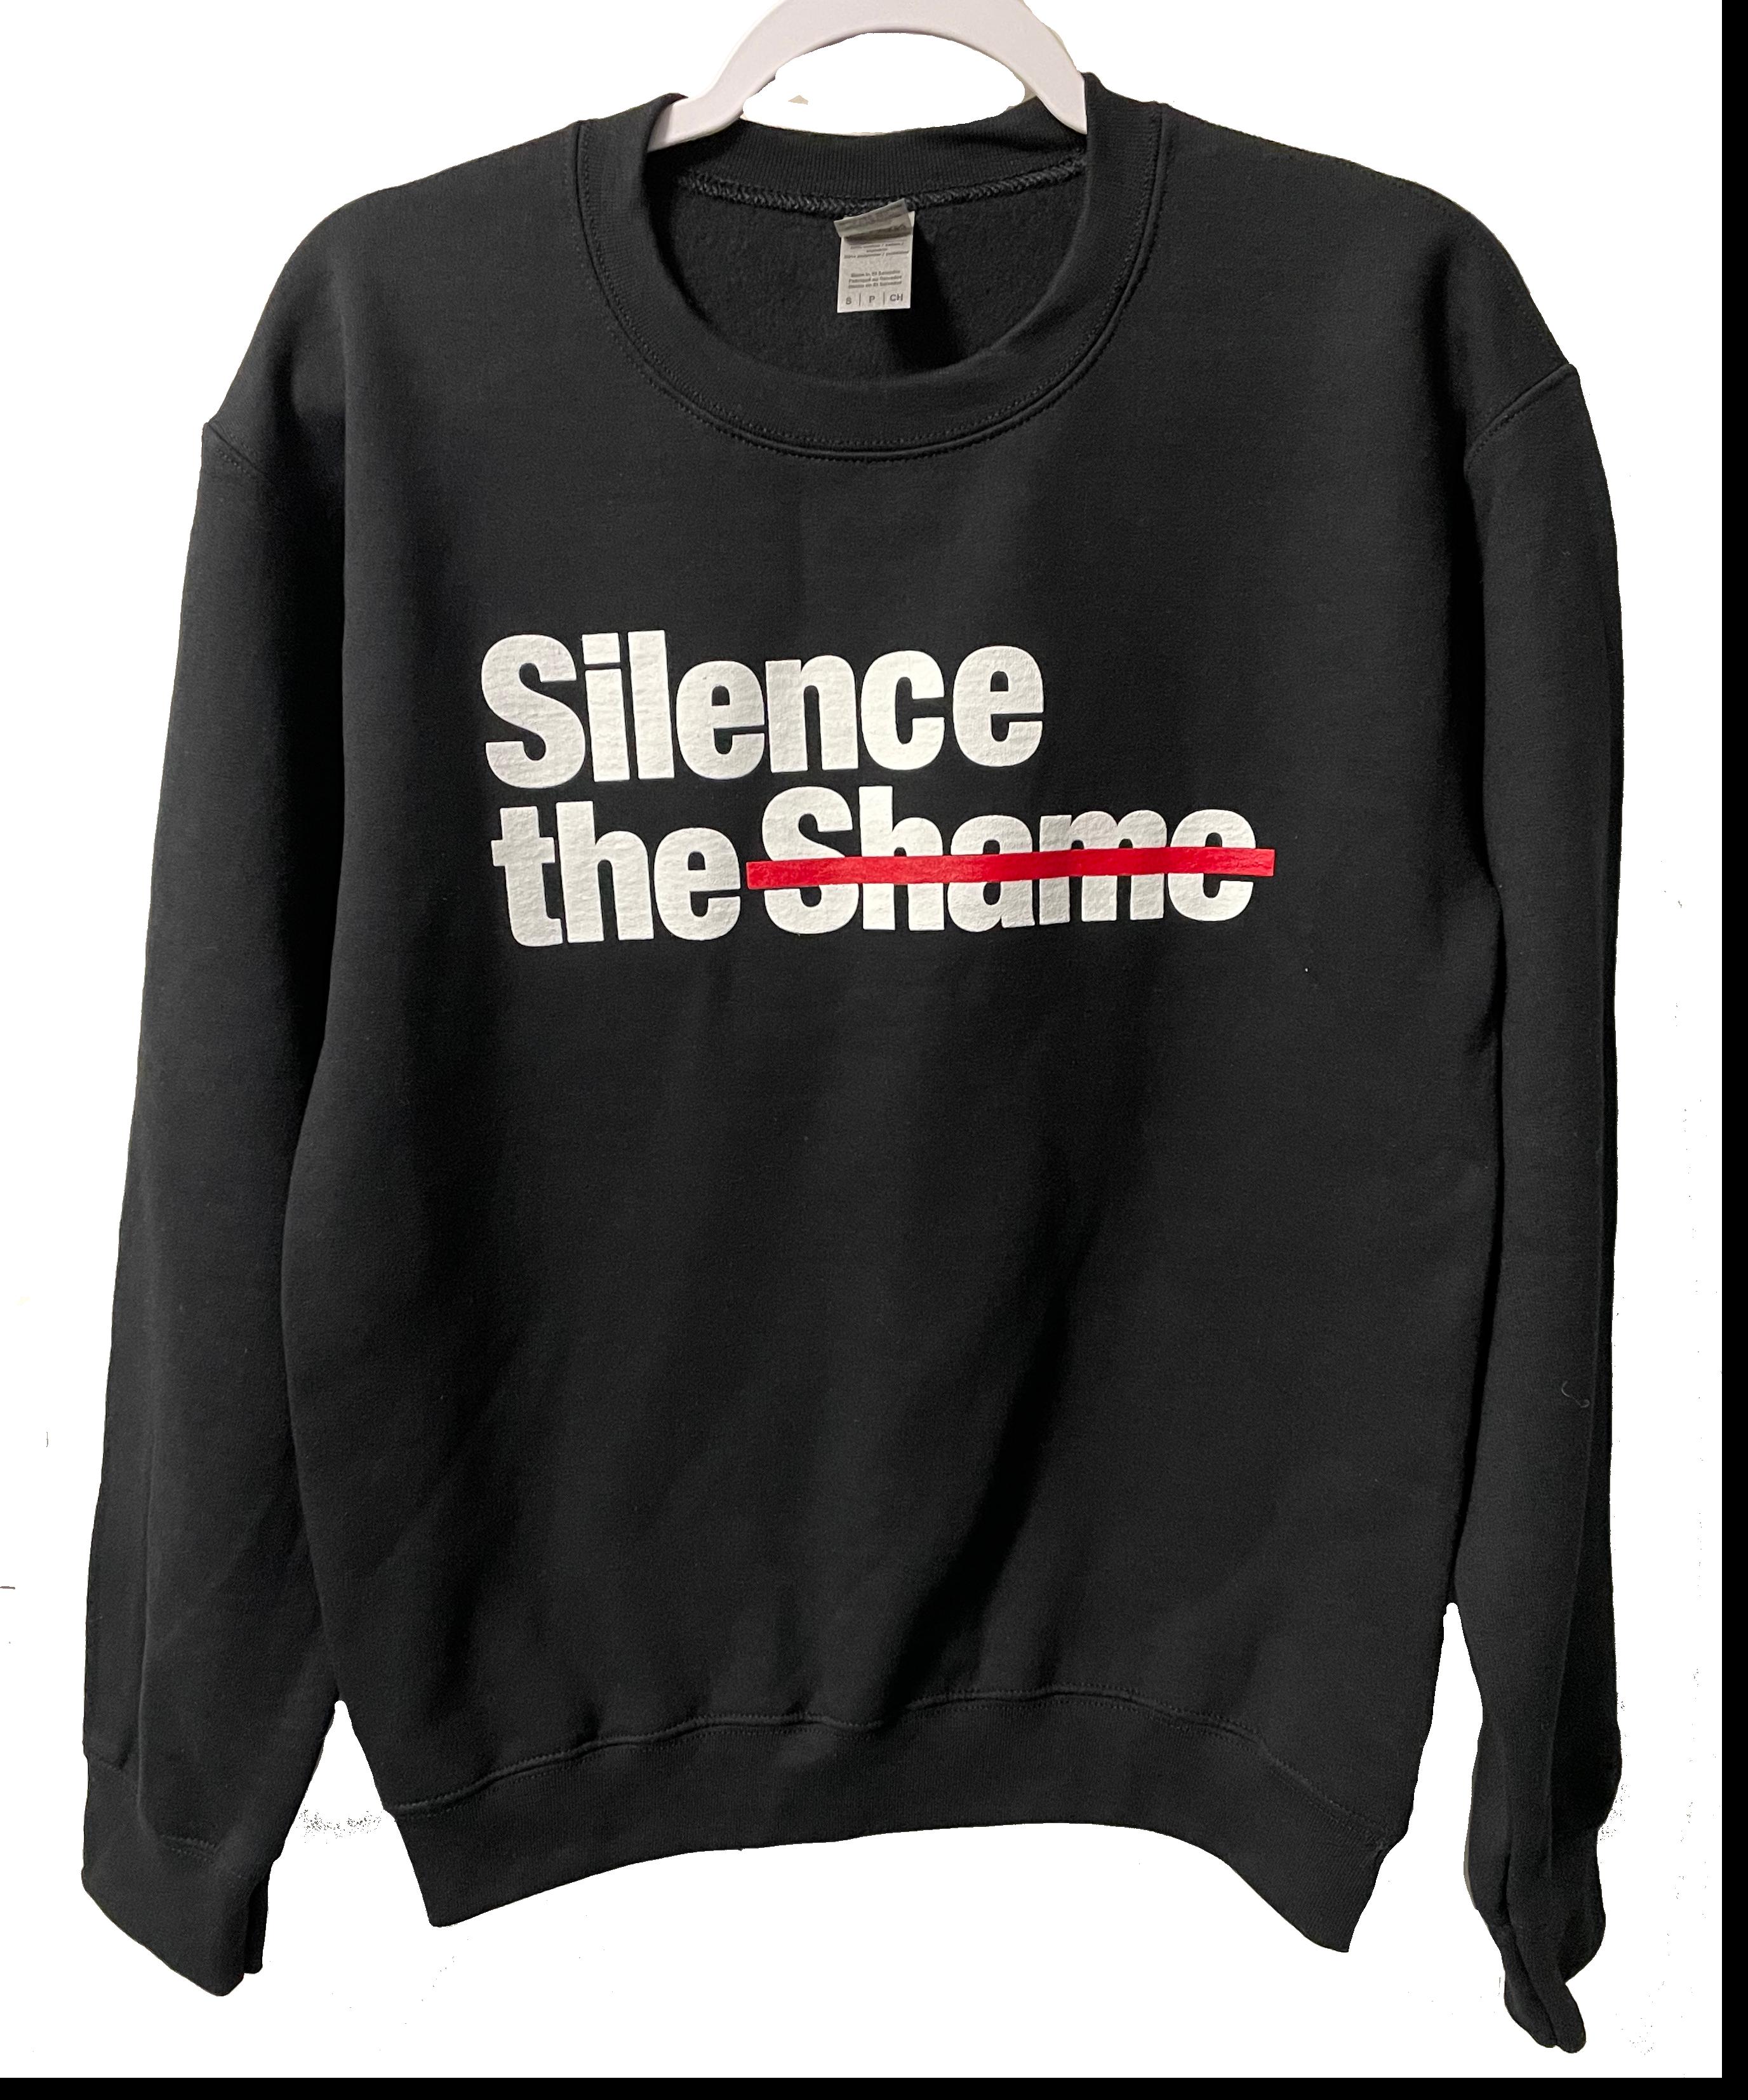 Silence the Shame Signature Black Crewneck Sweatshirt 4XL